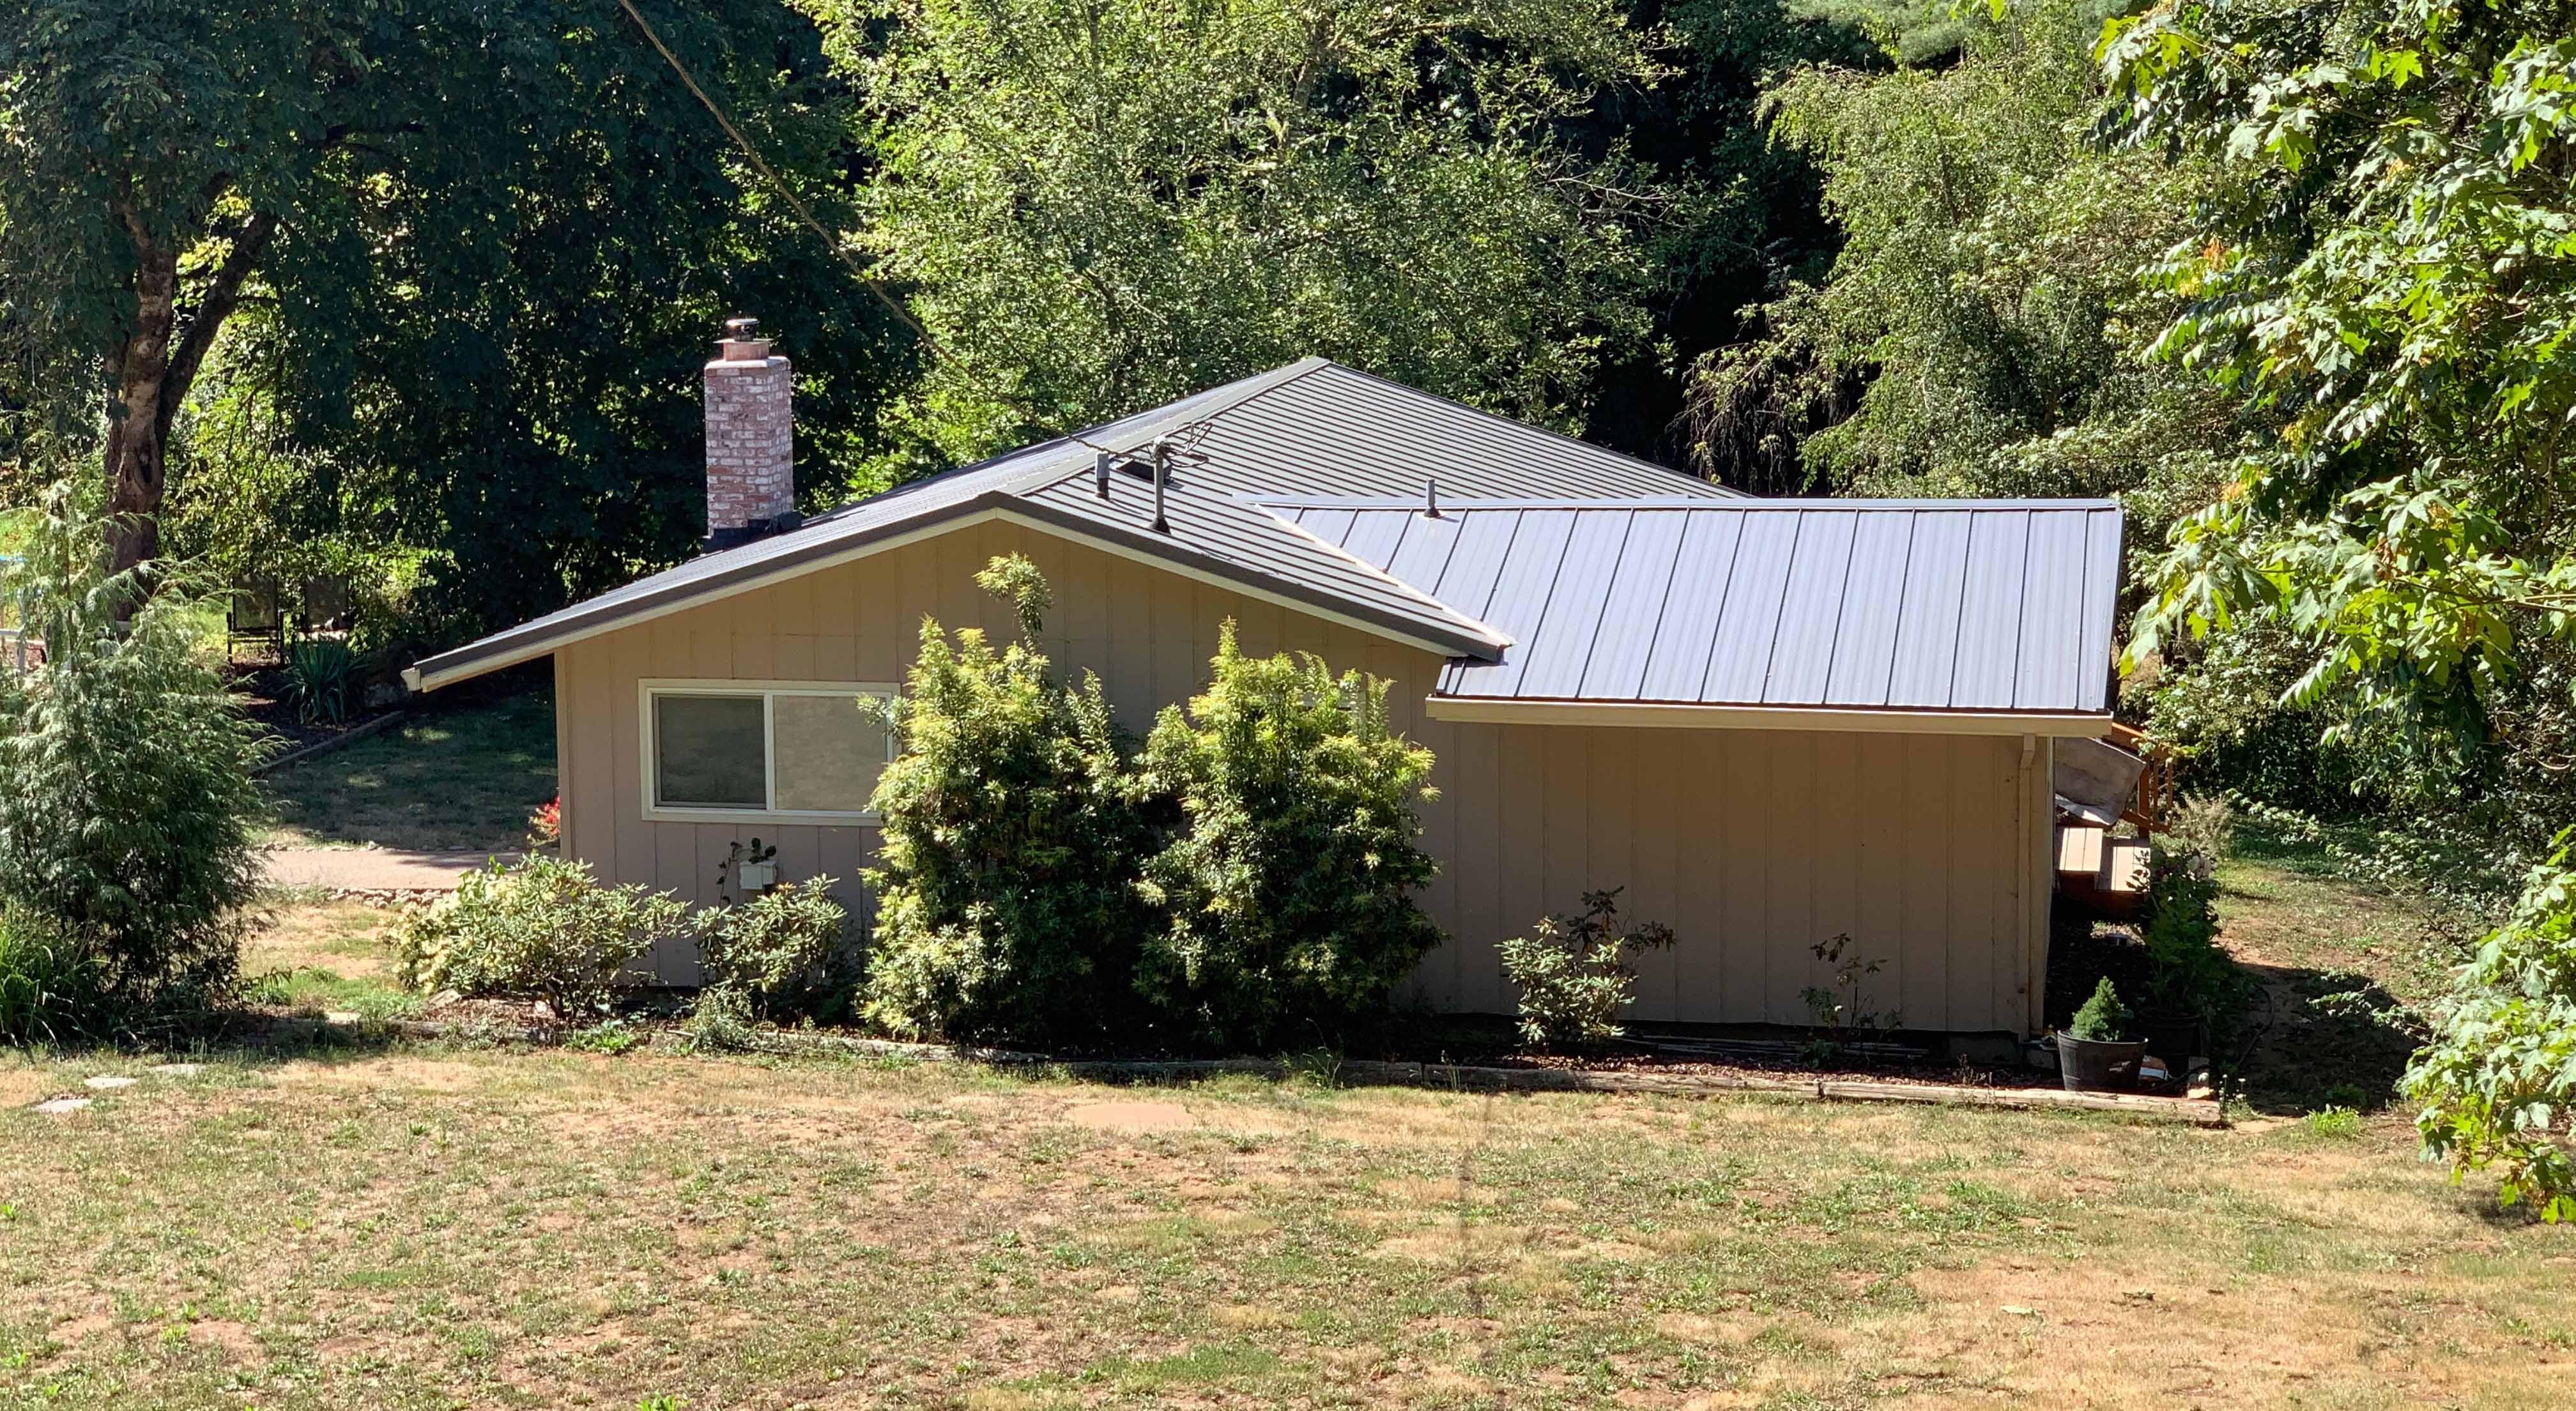 Roofing082901-1adj